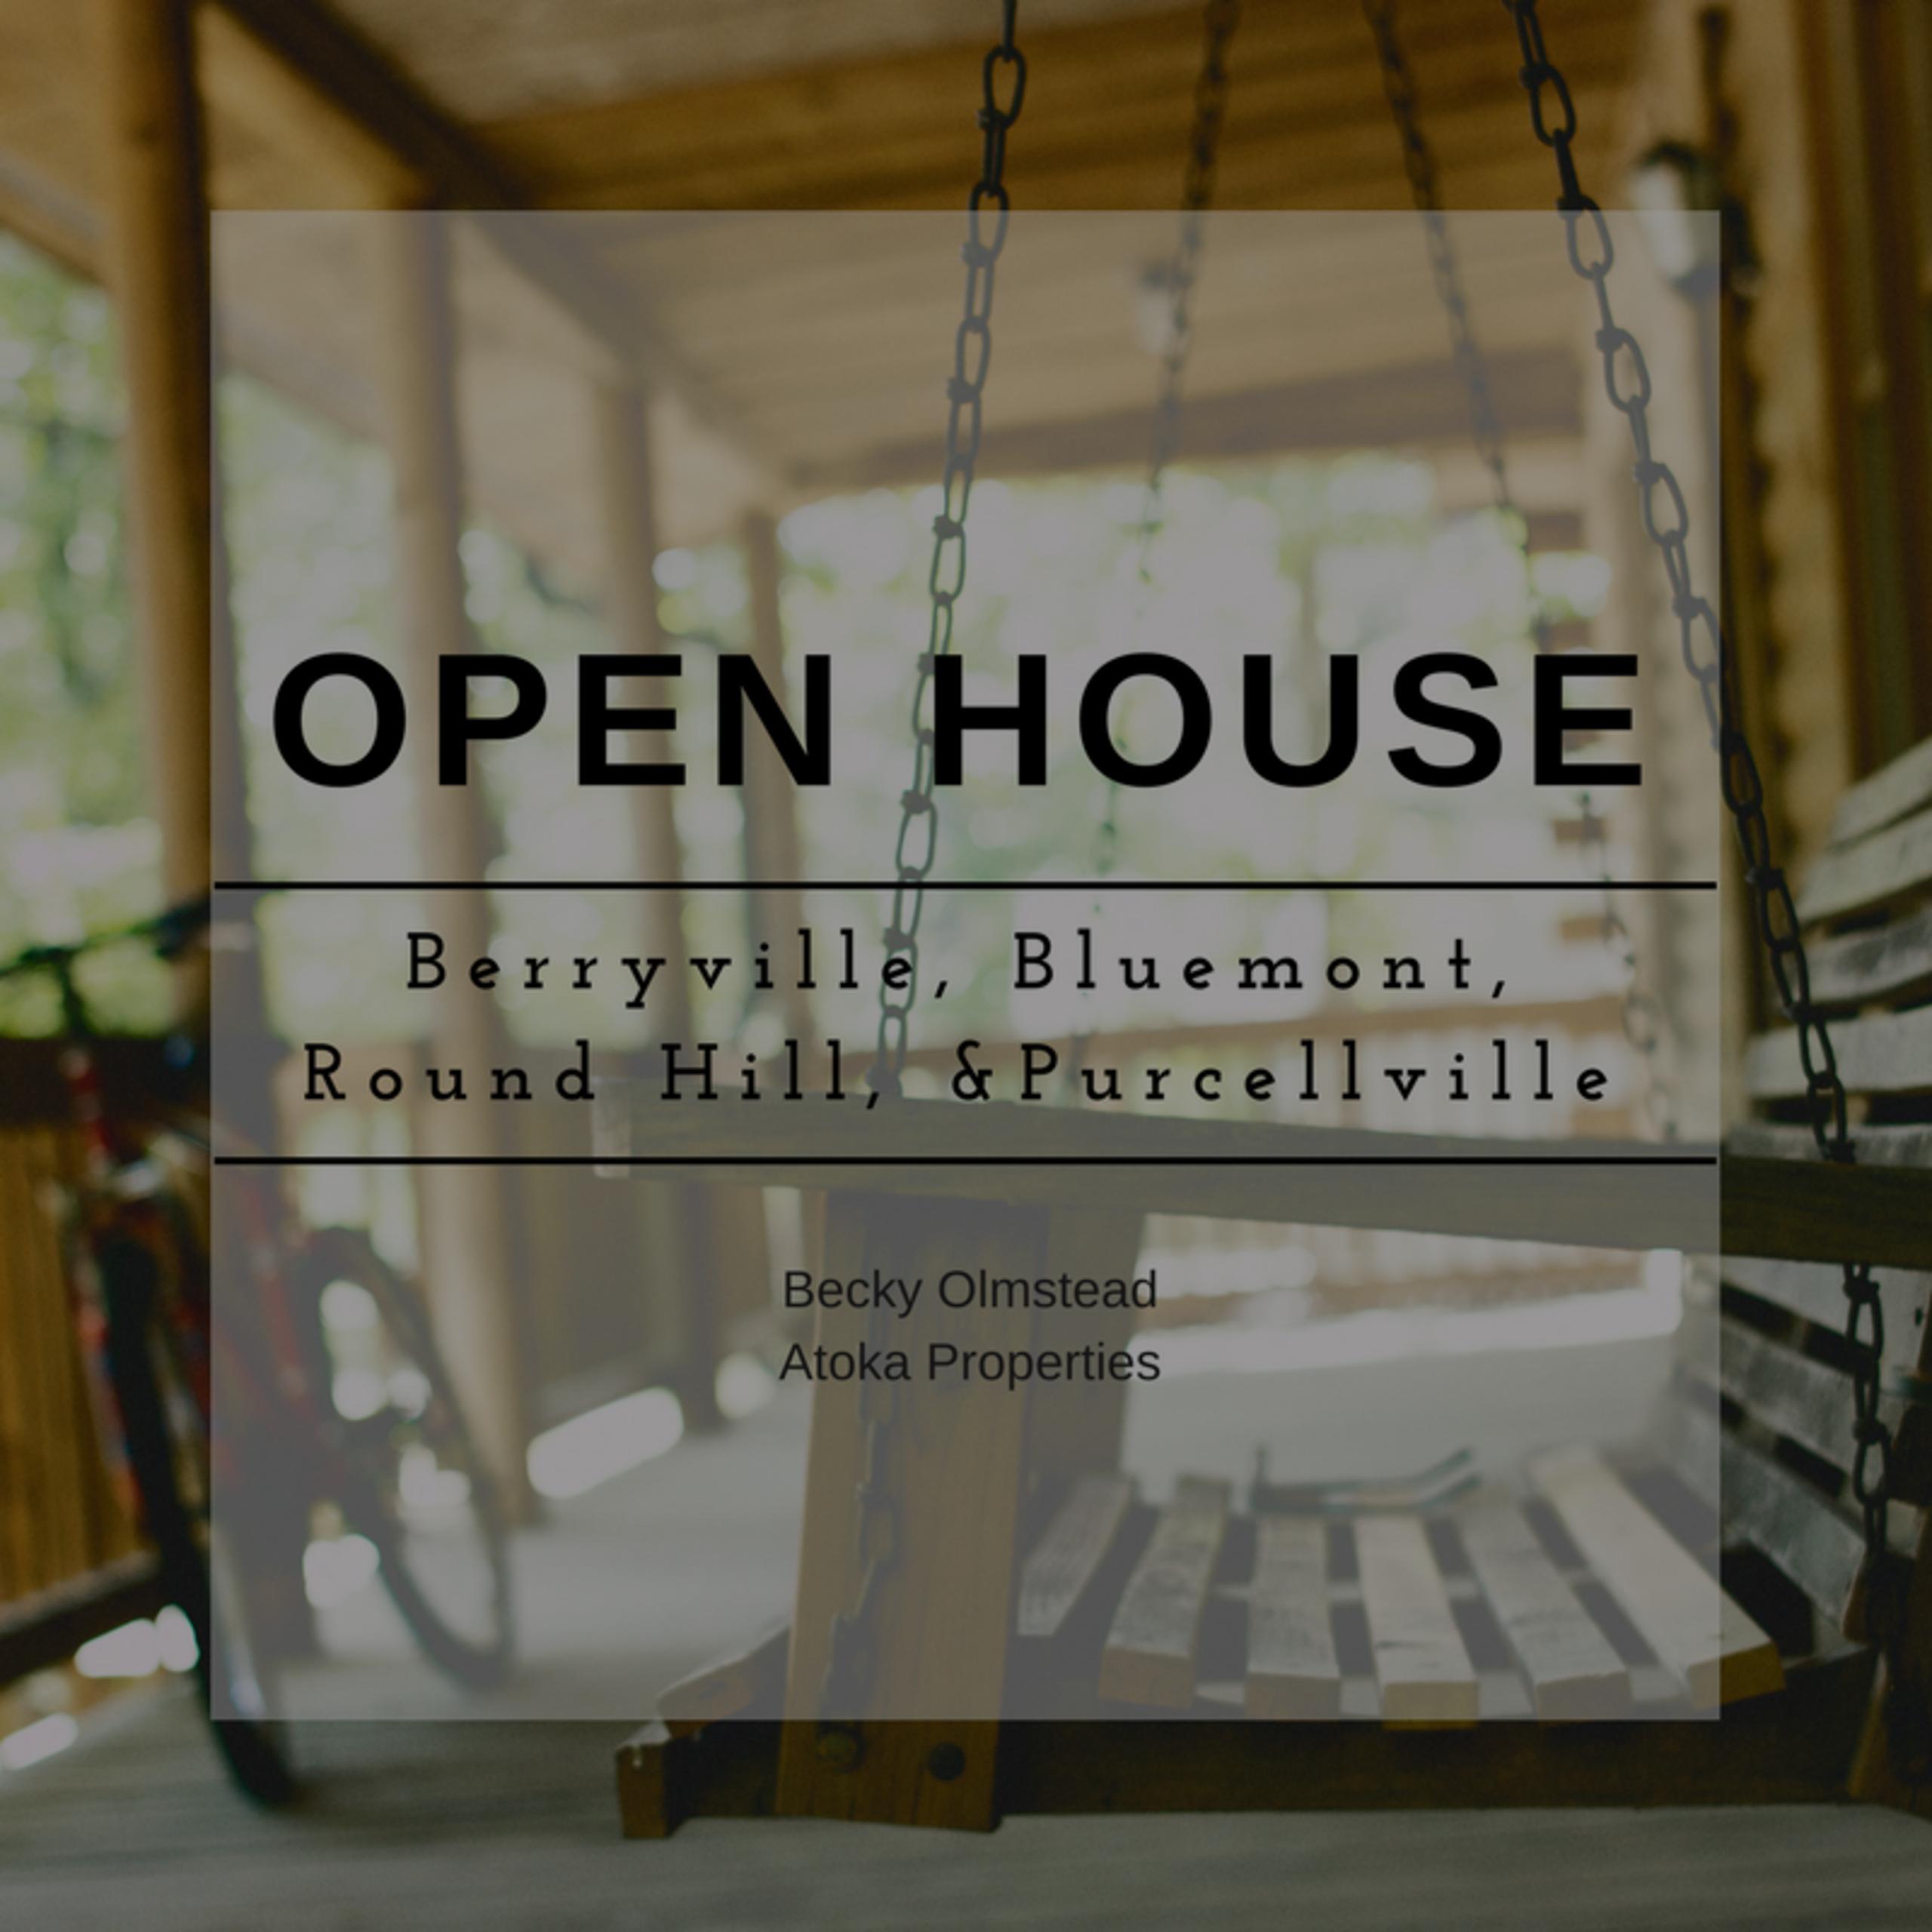 OPEN HOUSE LIST 1/20/18 – 1/21/18